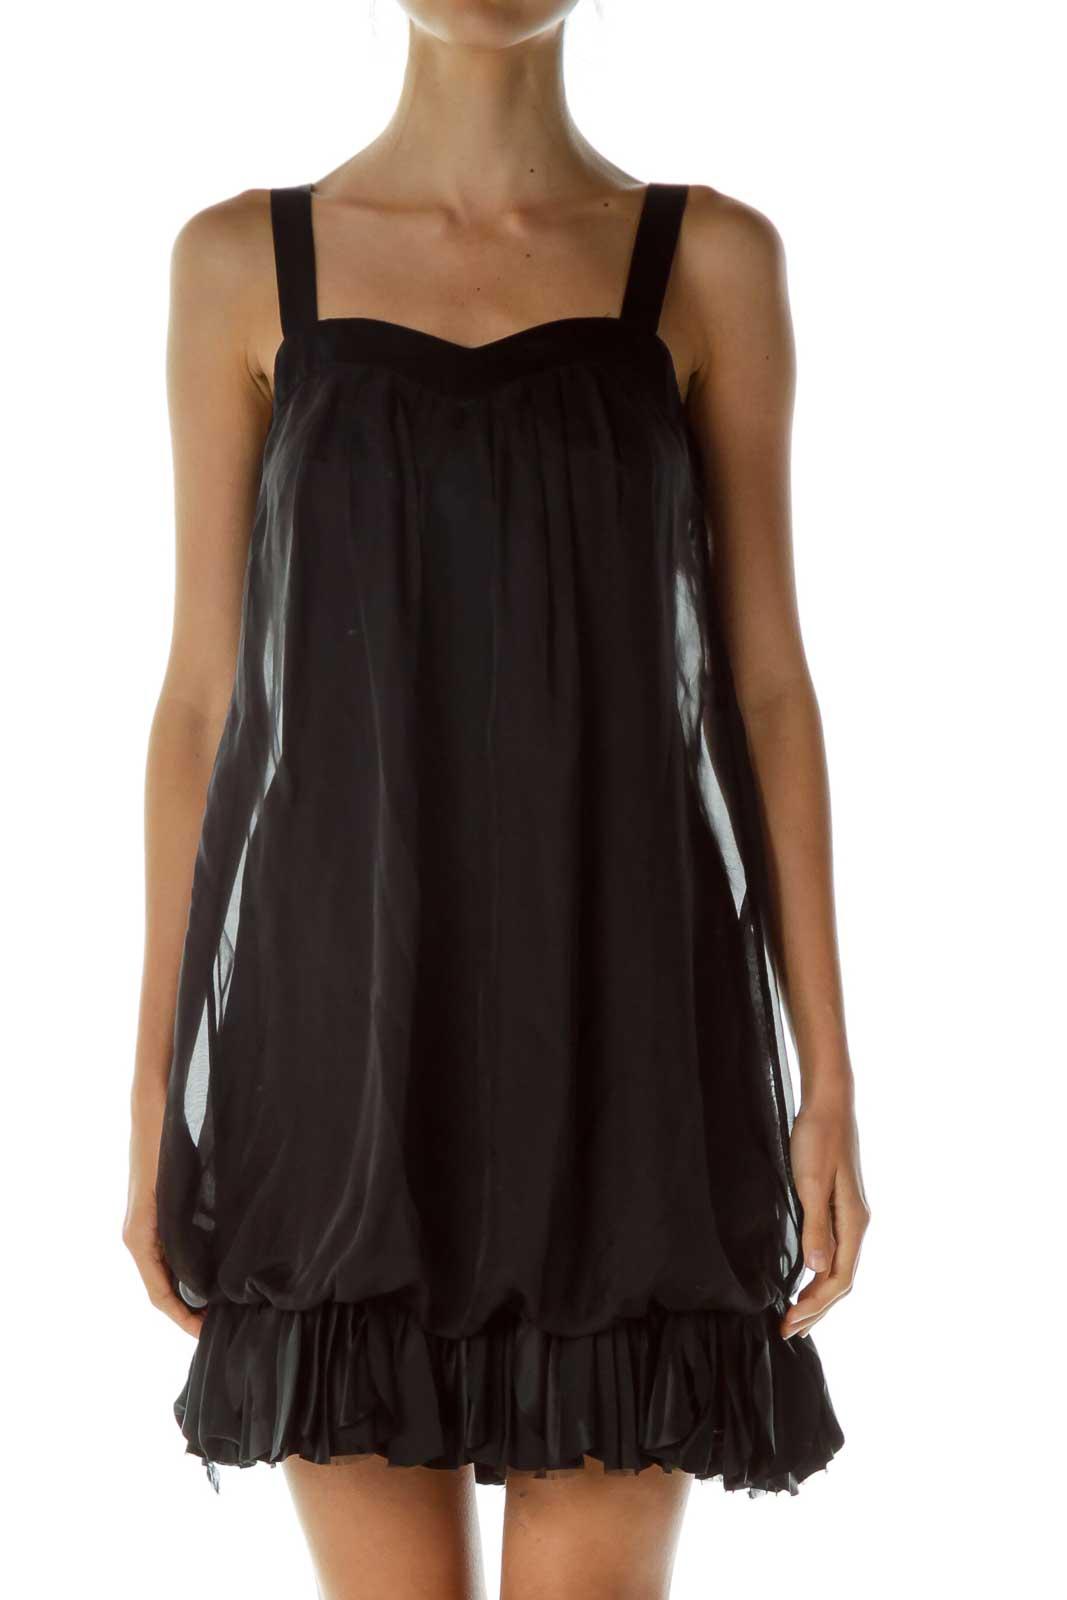 Black Ruffled Sweetheart Neckline Cocktail Dress